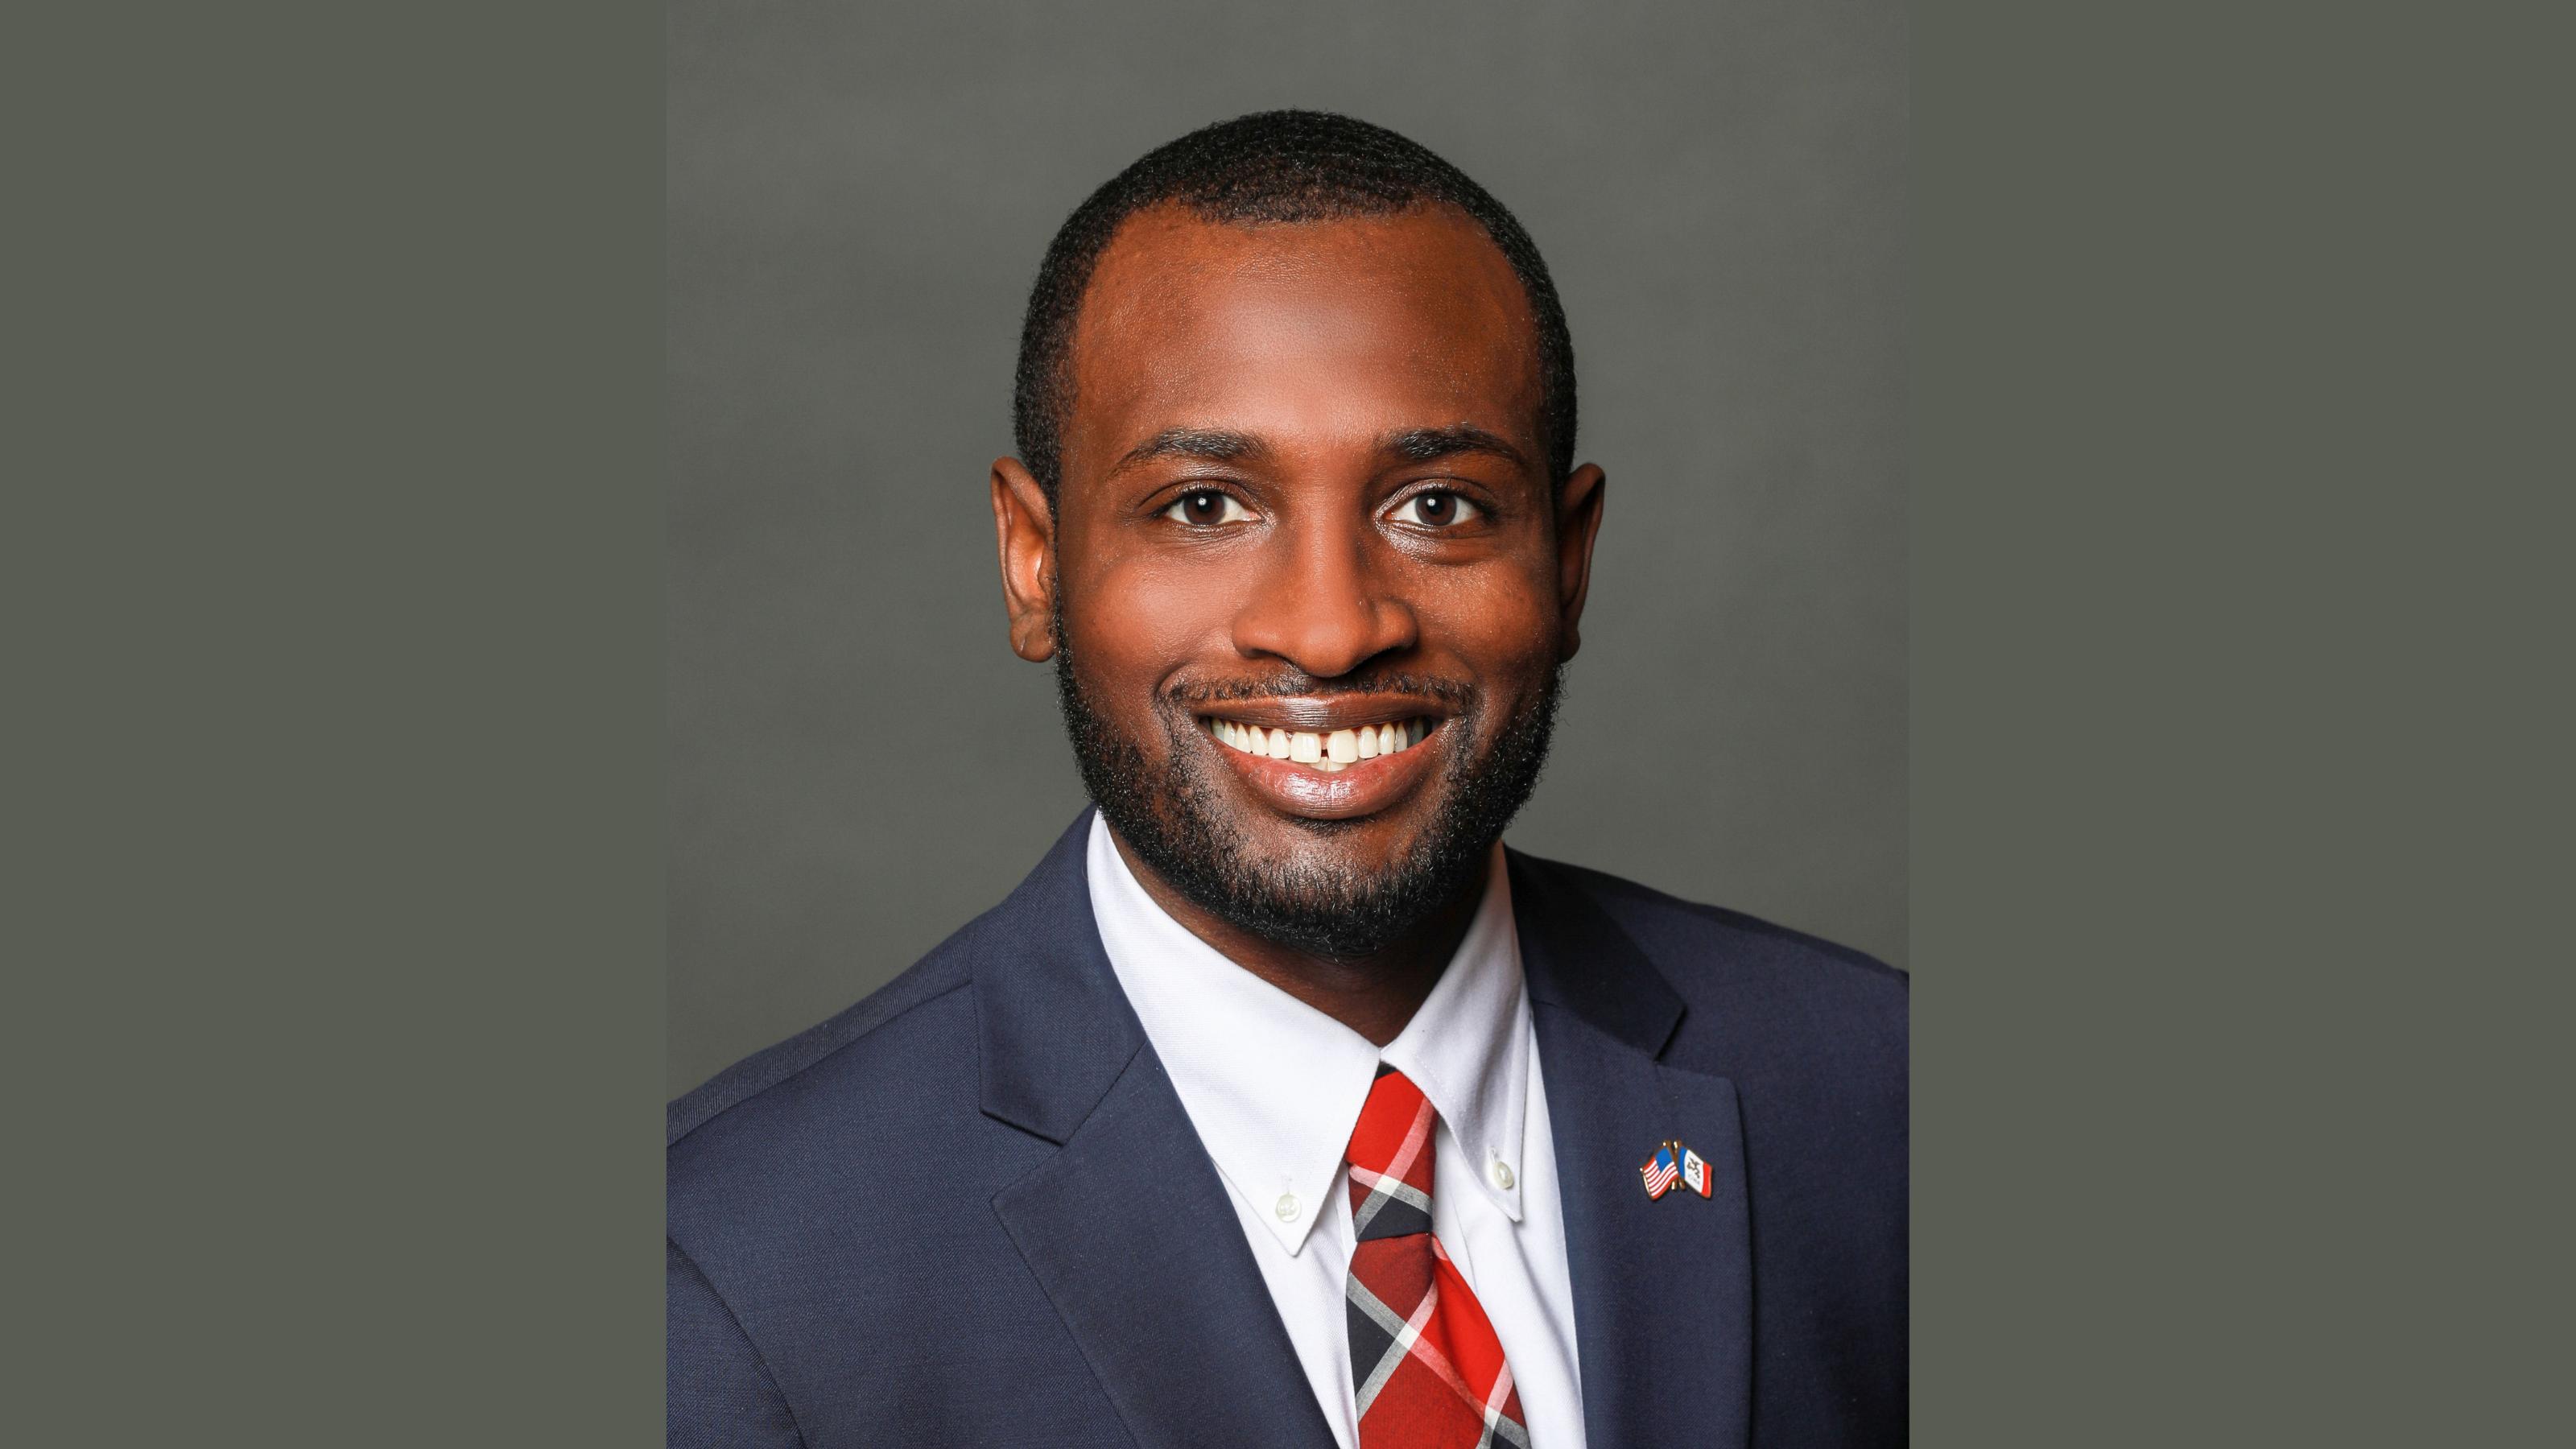 Democrat Rep. Ras Smith announces run for Iowa governor - Iowa Capital Dispatch